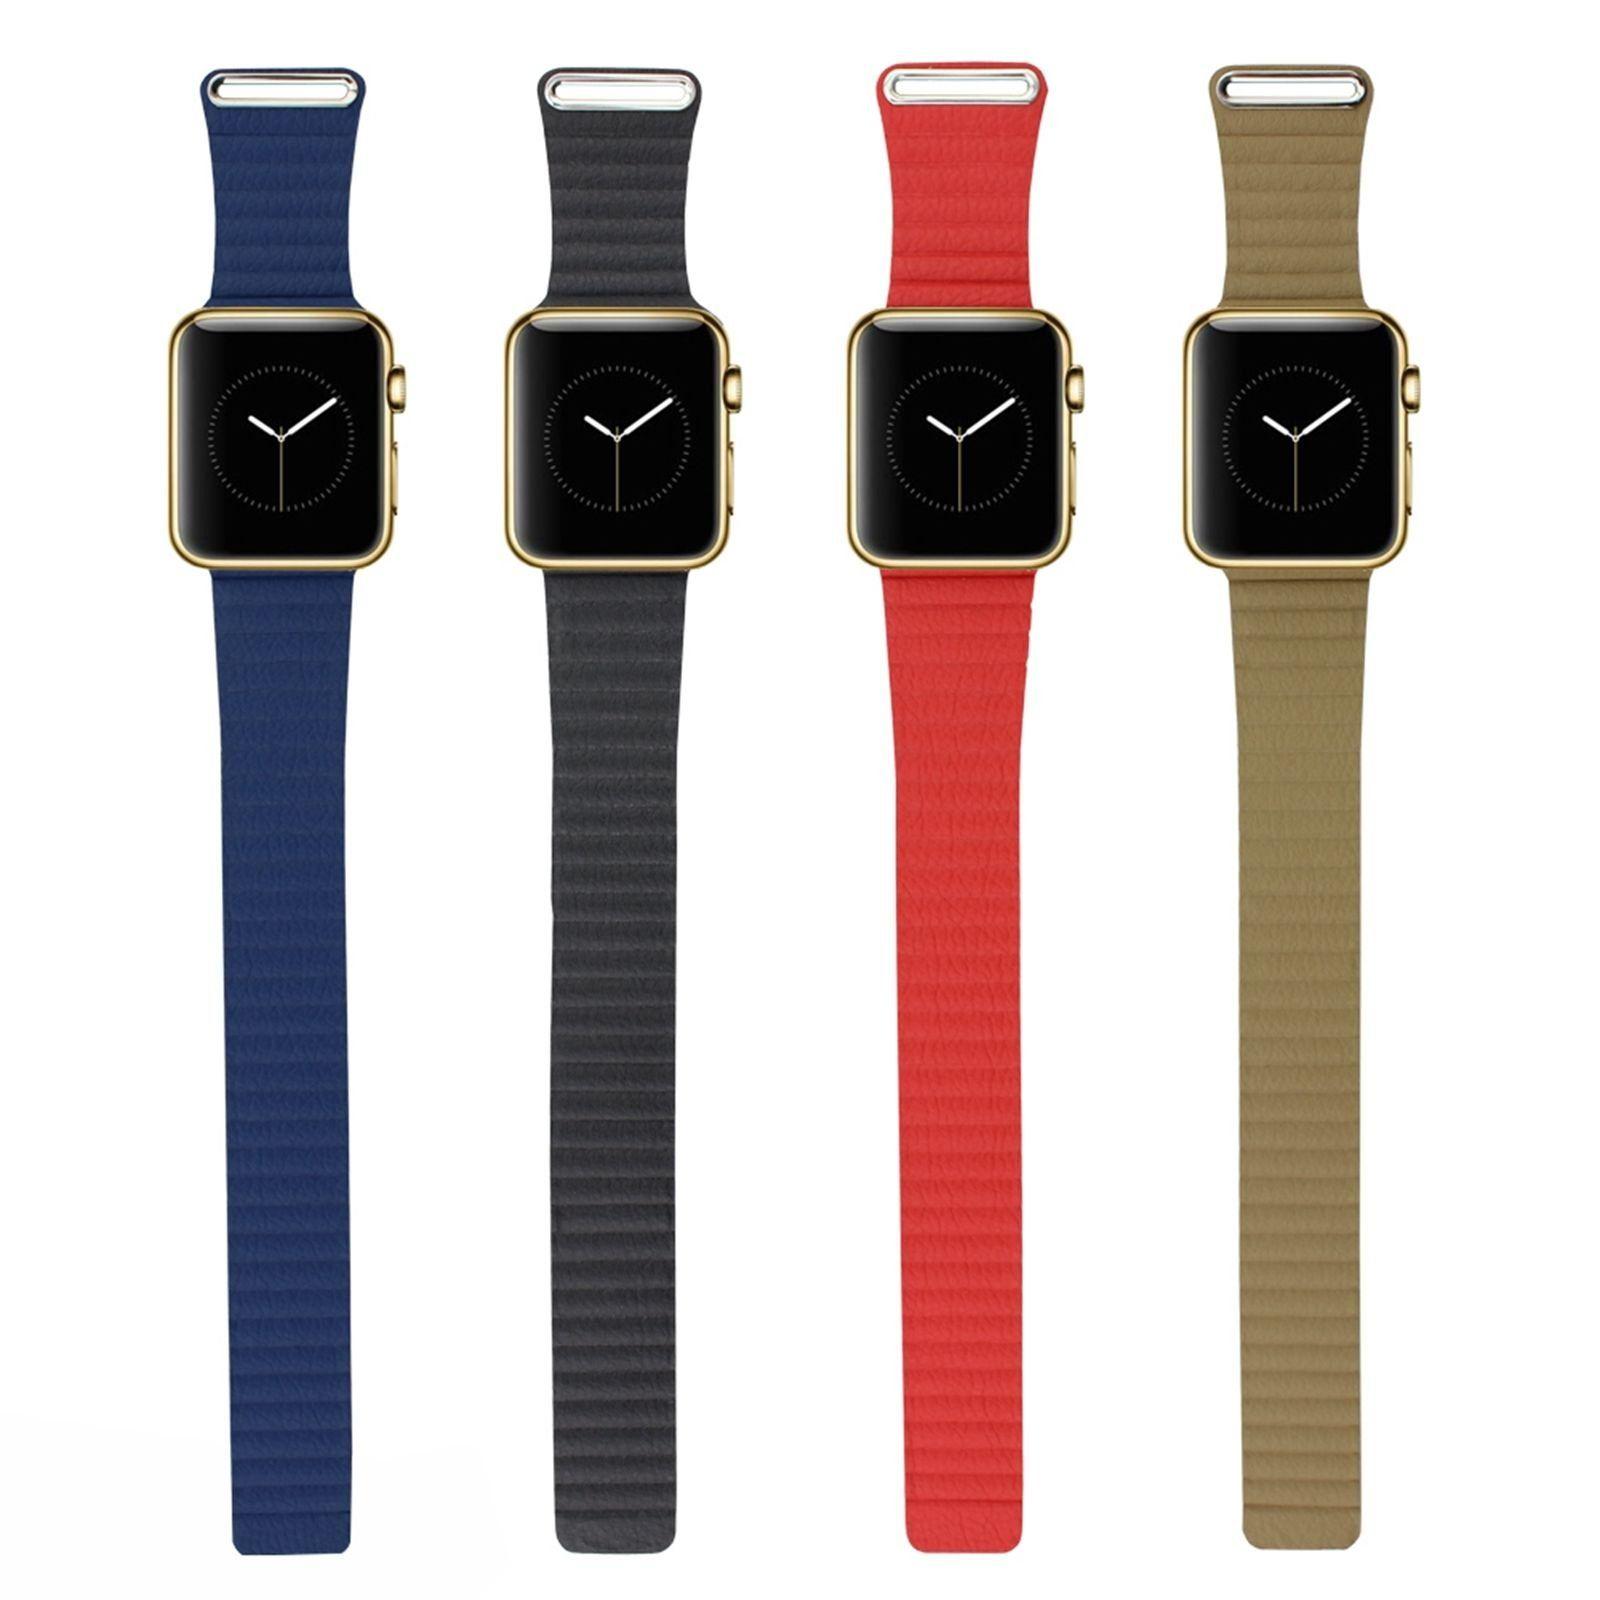 Superisun Luxury Leather Loop Strap Watch Band